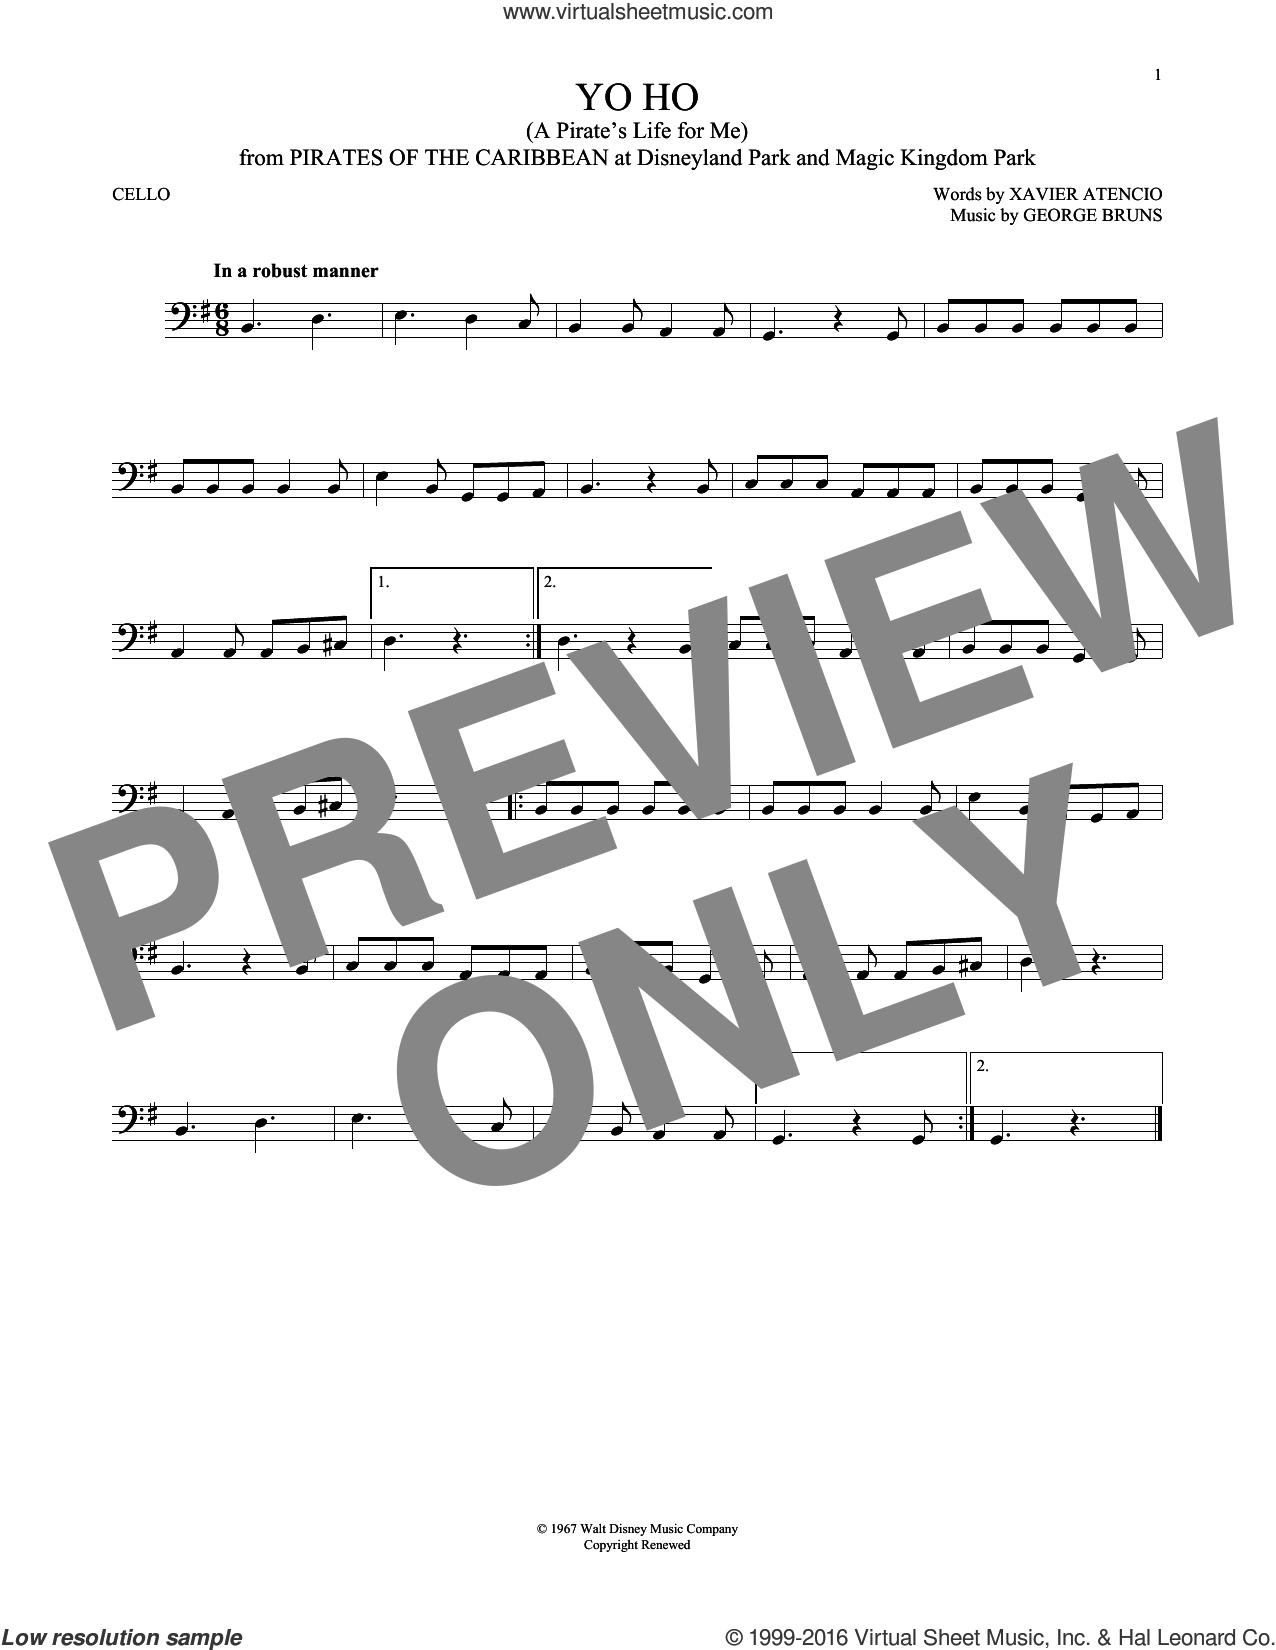 Yo Ho (A Pirate's Life For Me) sheet music for cello solo by George Bruns and Xavier Atencio, intermediate skill level